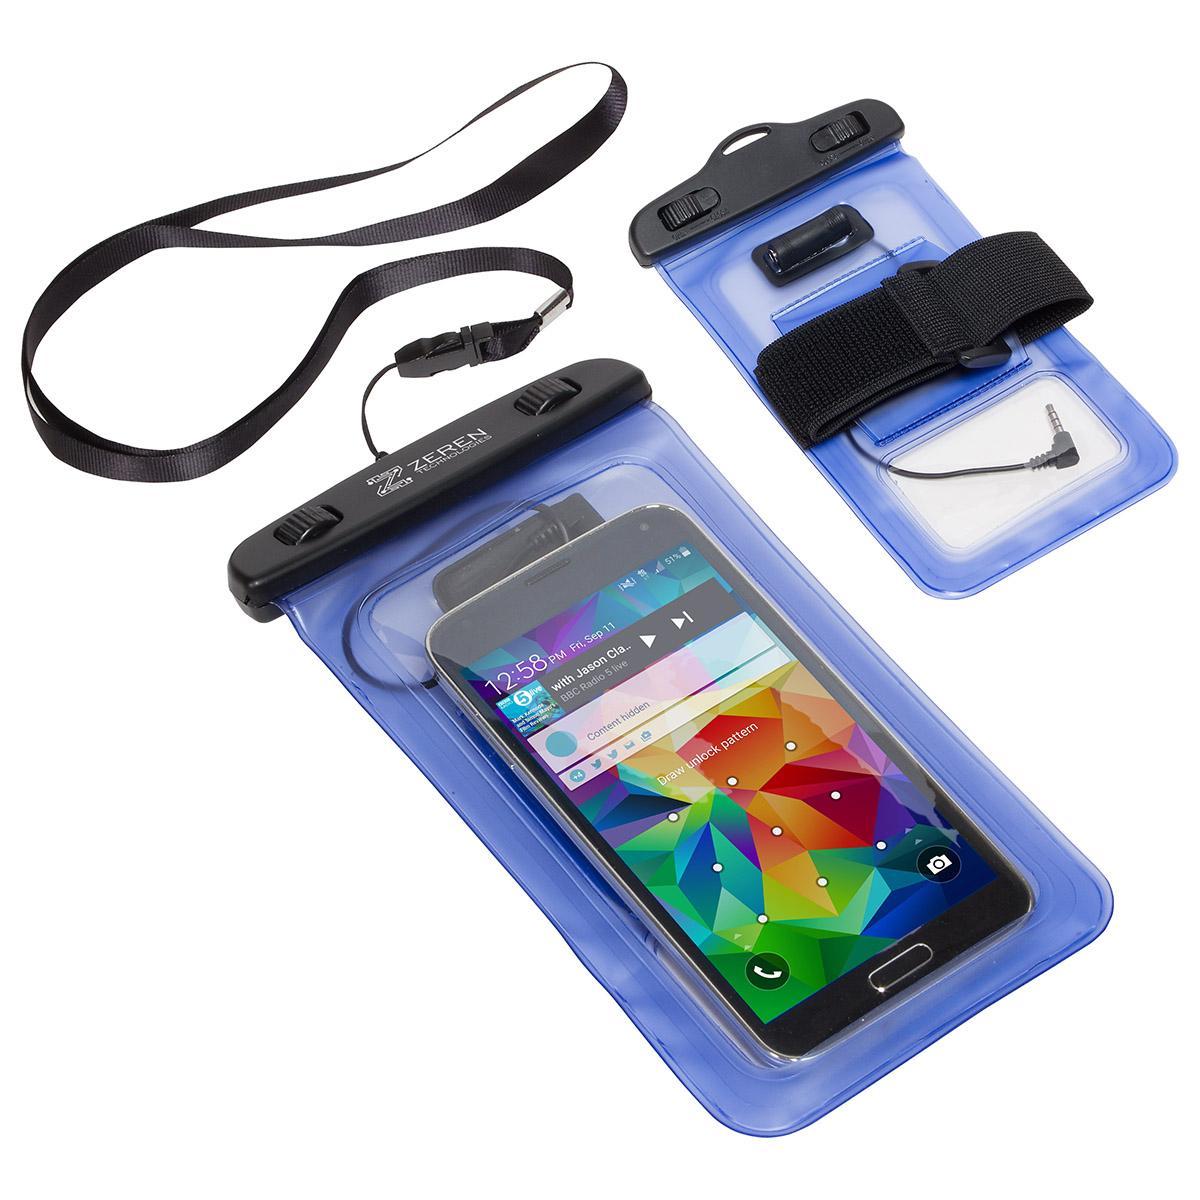 Waterproof Smart Phone Case with 3.5mm Audio Jack, WOR-SP16, 1 Colour Imprint